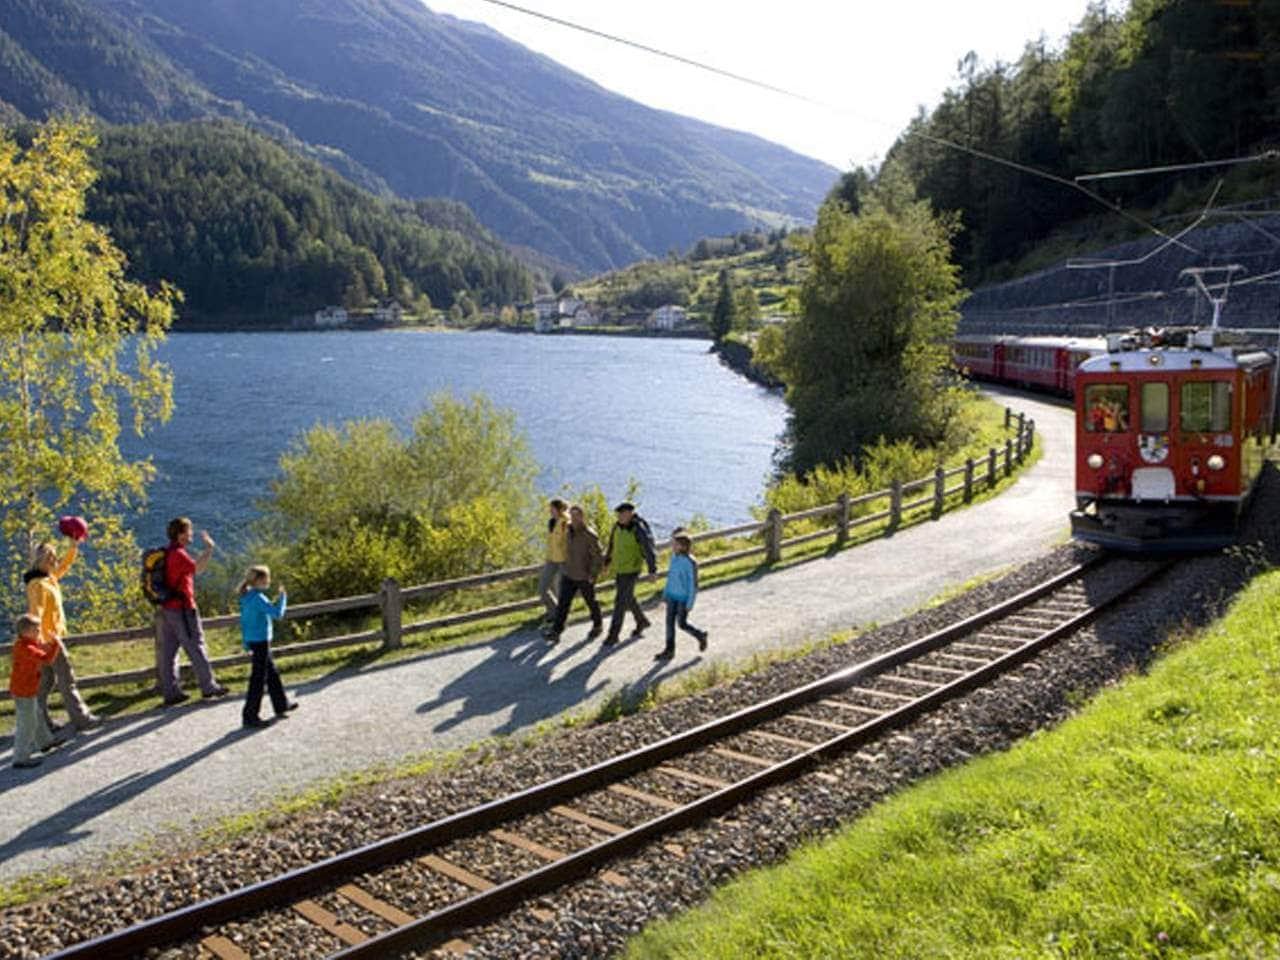 Wandern auf der Via Albula/Bernina – Entlang dem UNESCO Welterbe